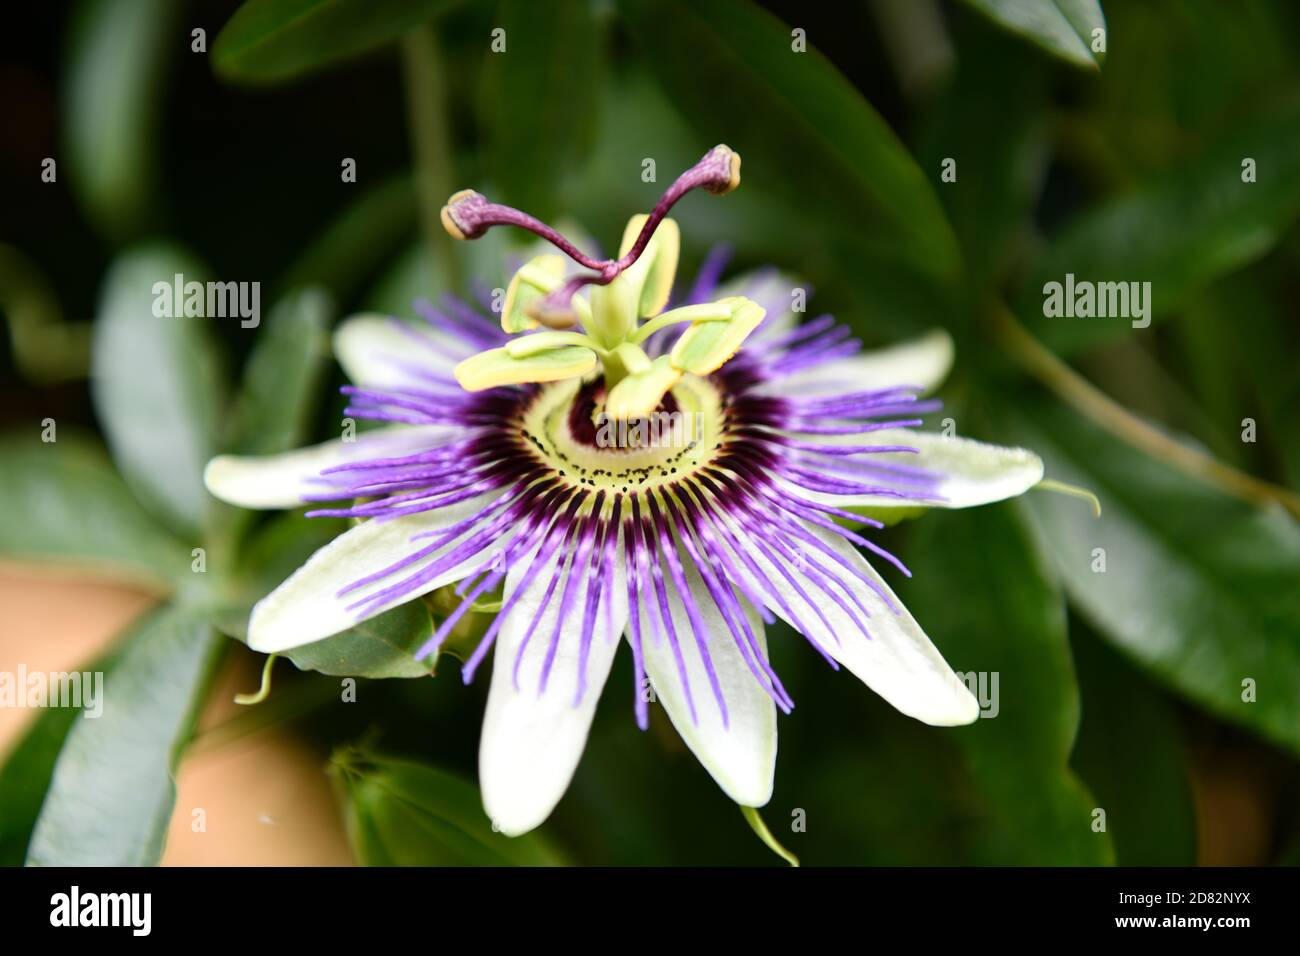 Flor de la pasión (Passiflora incarnata ) Foto de stock